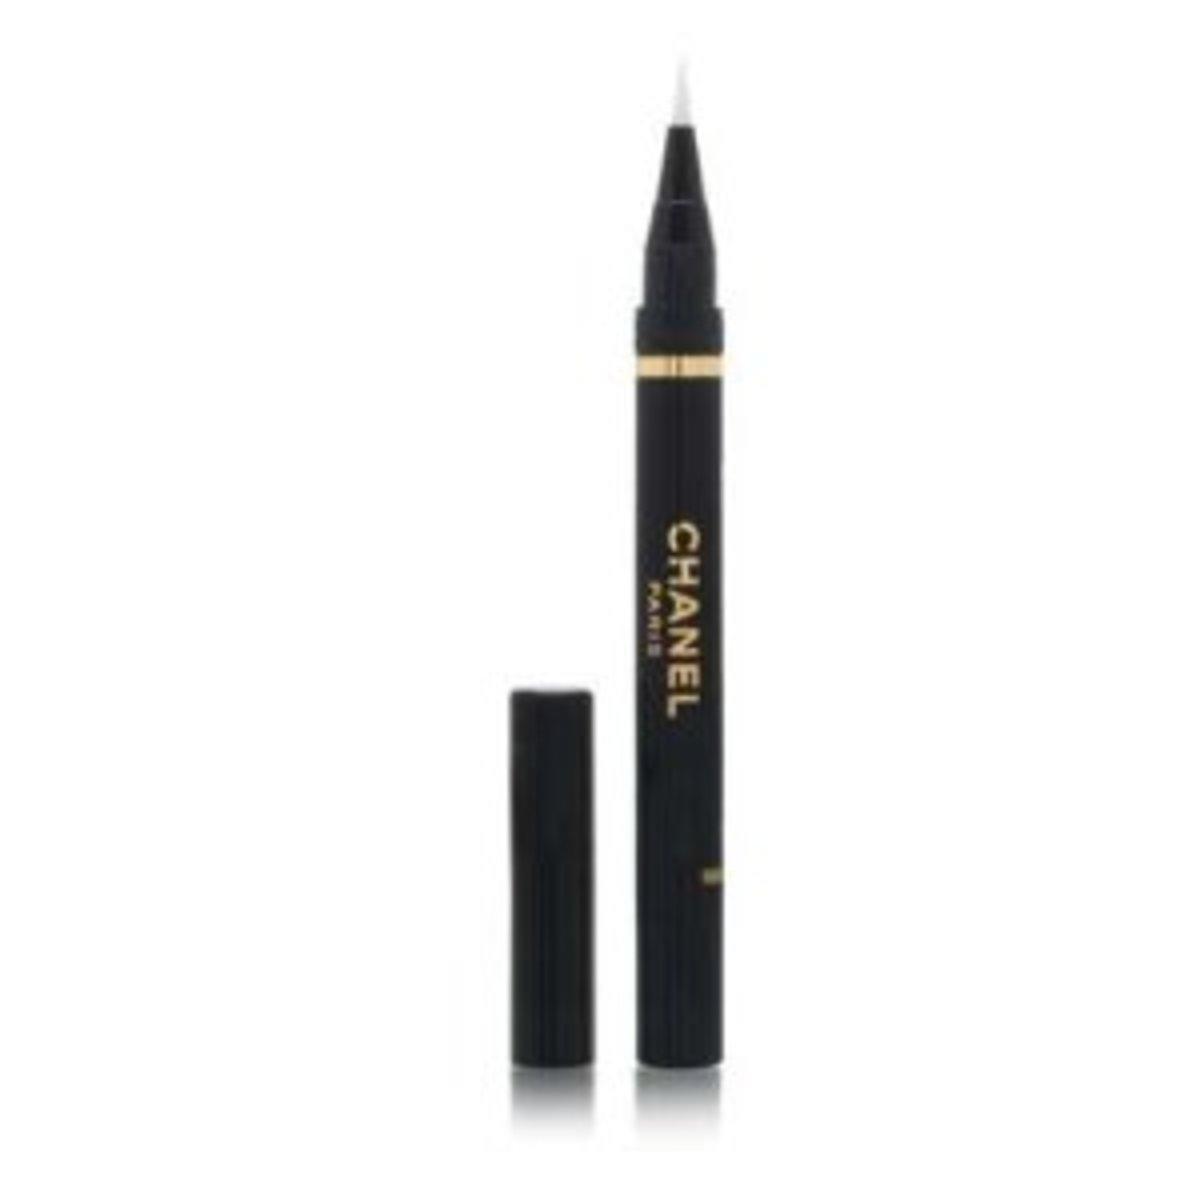 Chanel-Ecriture-Automatic-Liquid-Eyeliner